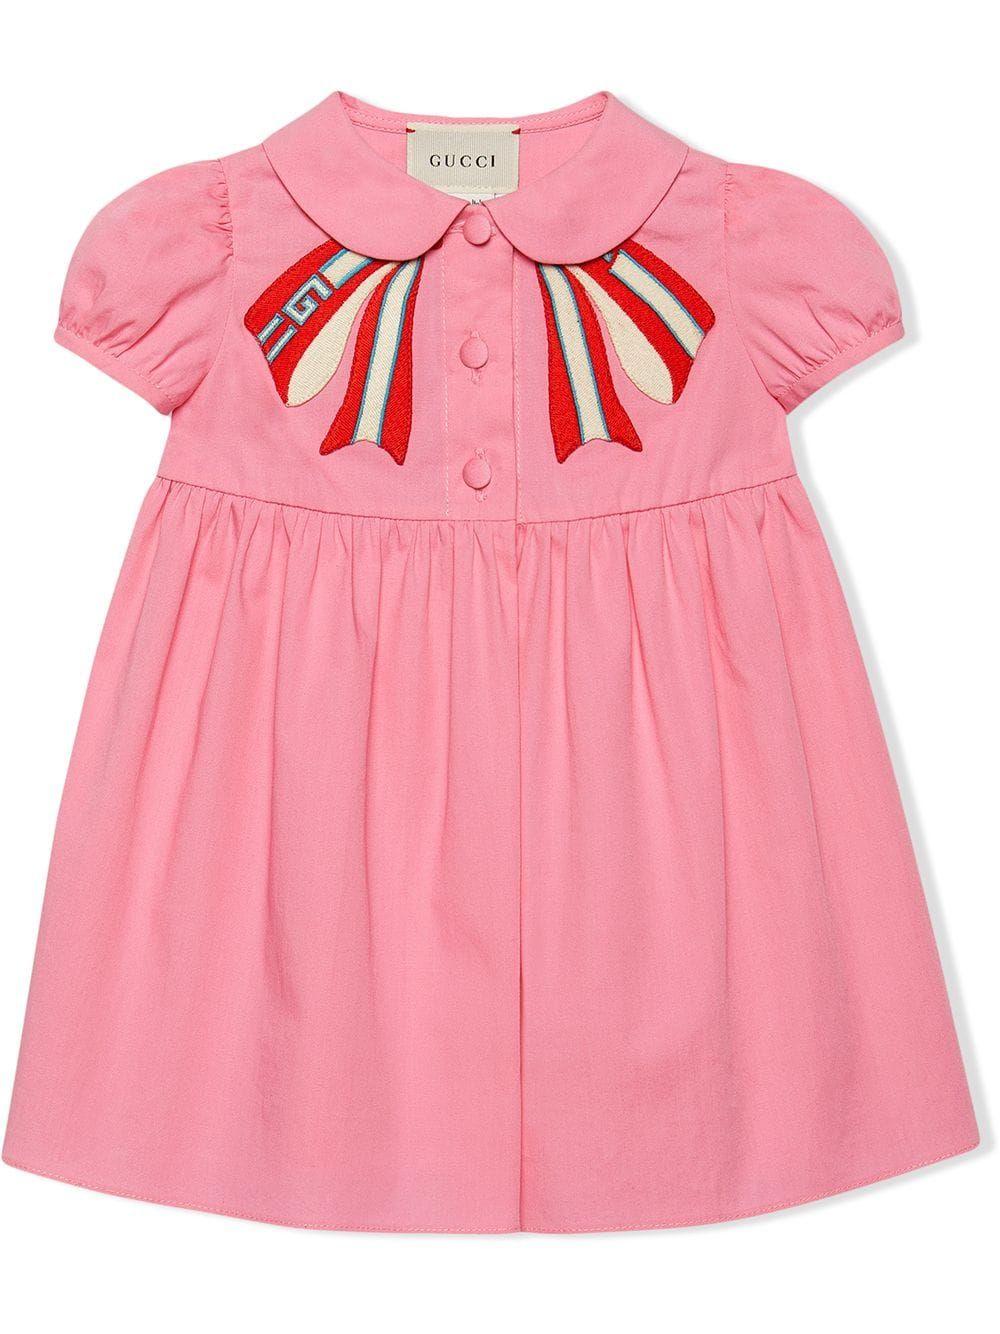 47+ Gucci baby dress ideas